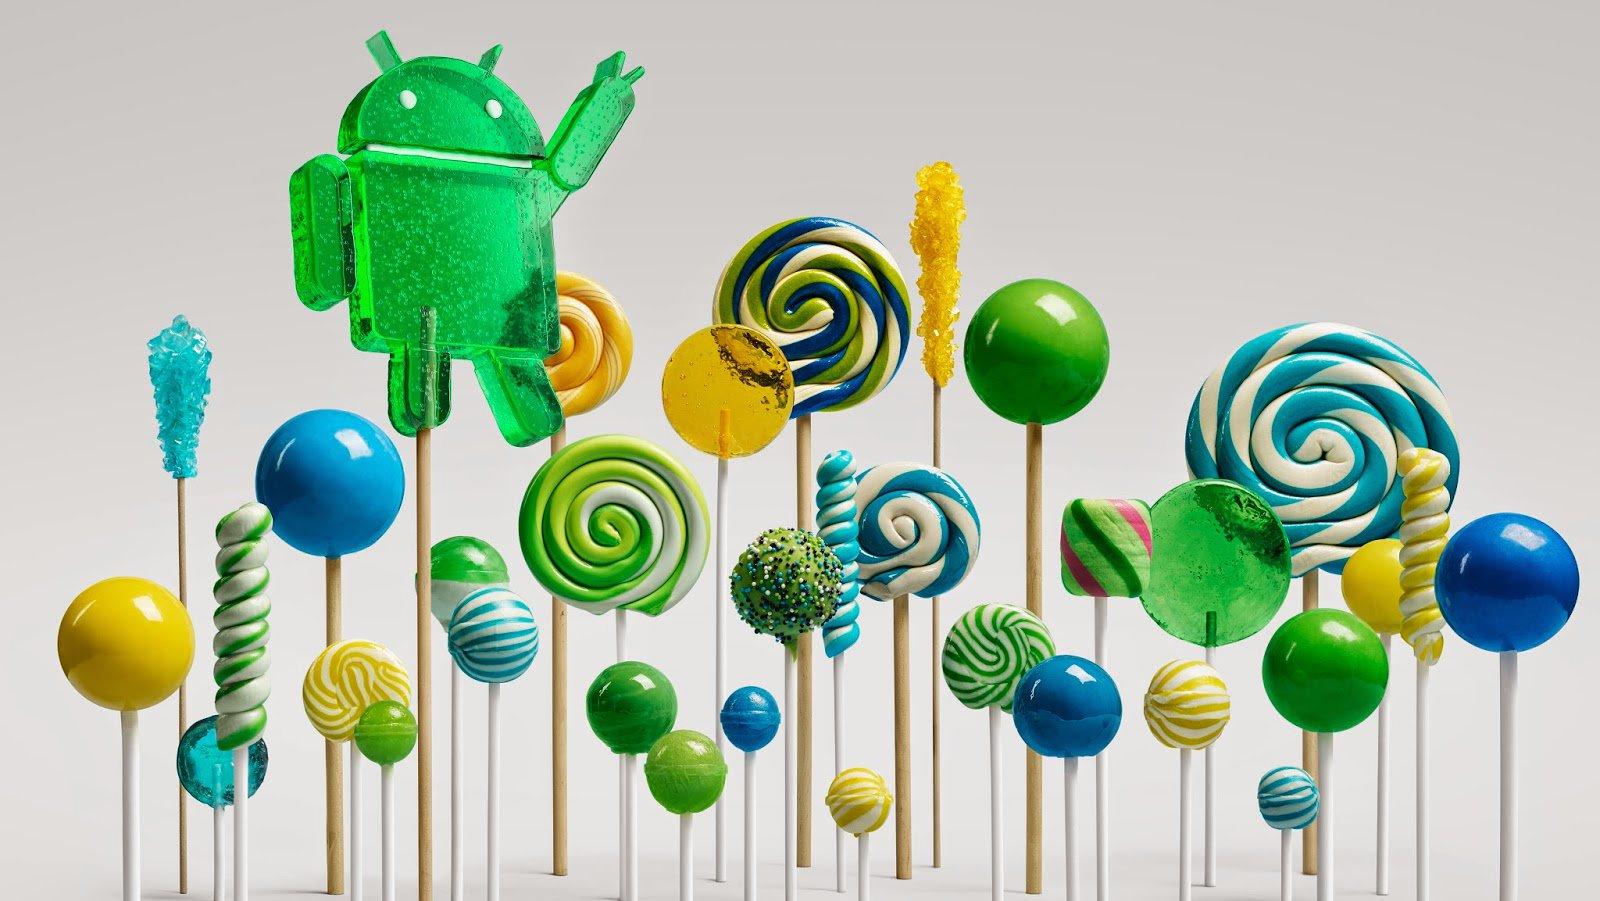 Android 5.0 Lollipop Coming To Nexus 7 And Nexus 10 On Nov 3